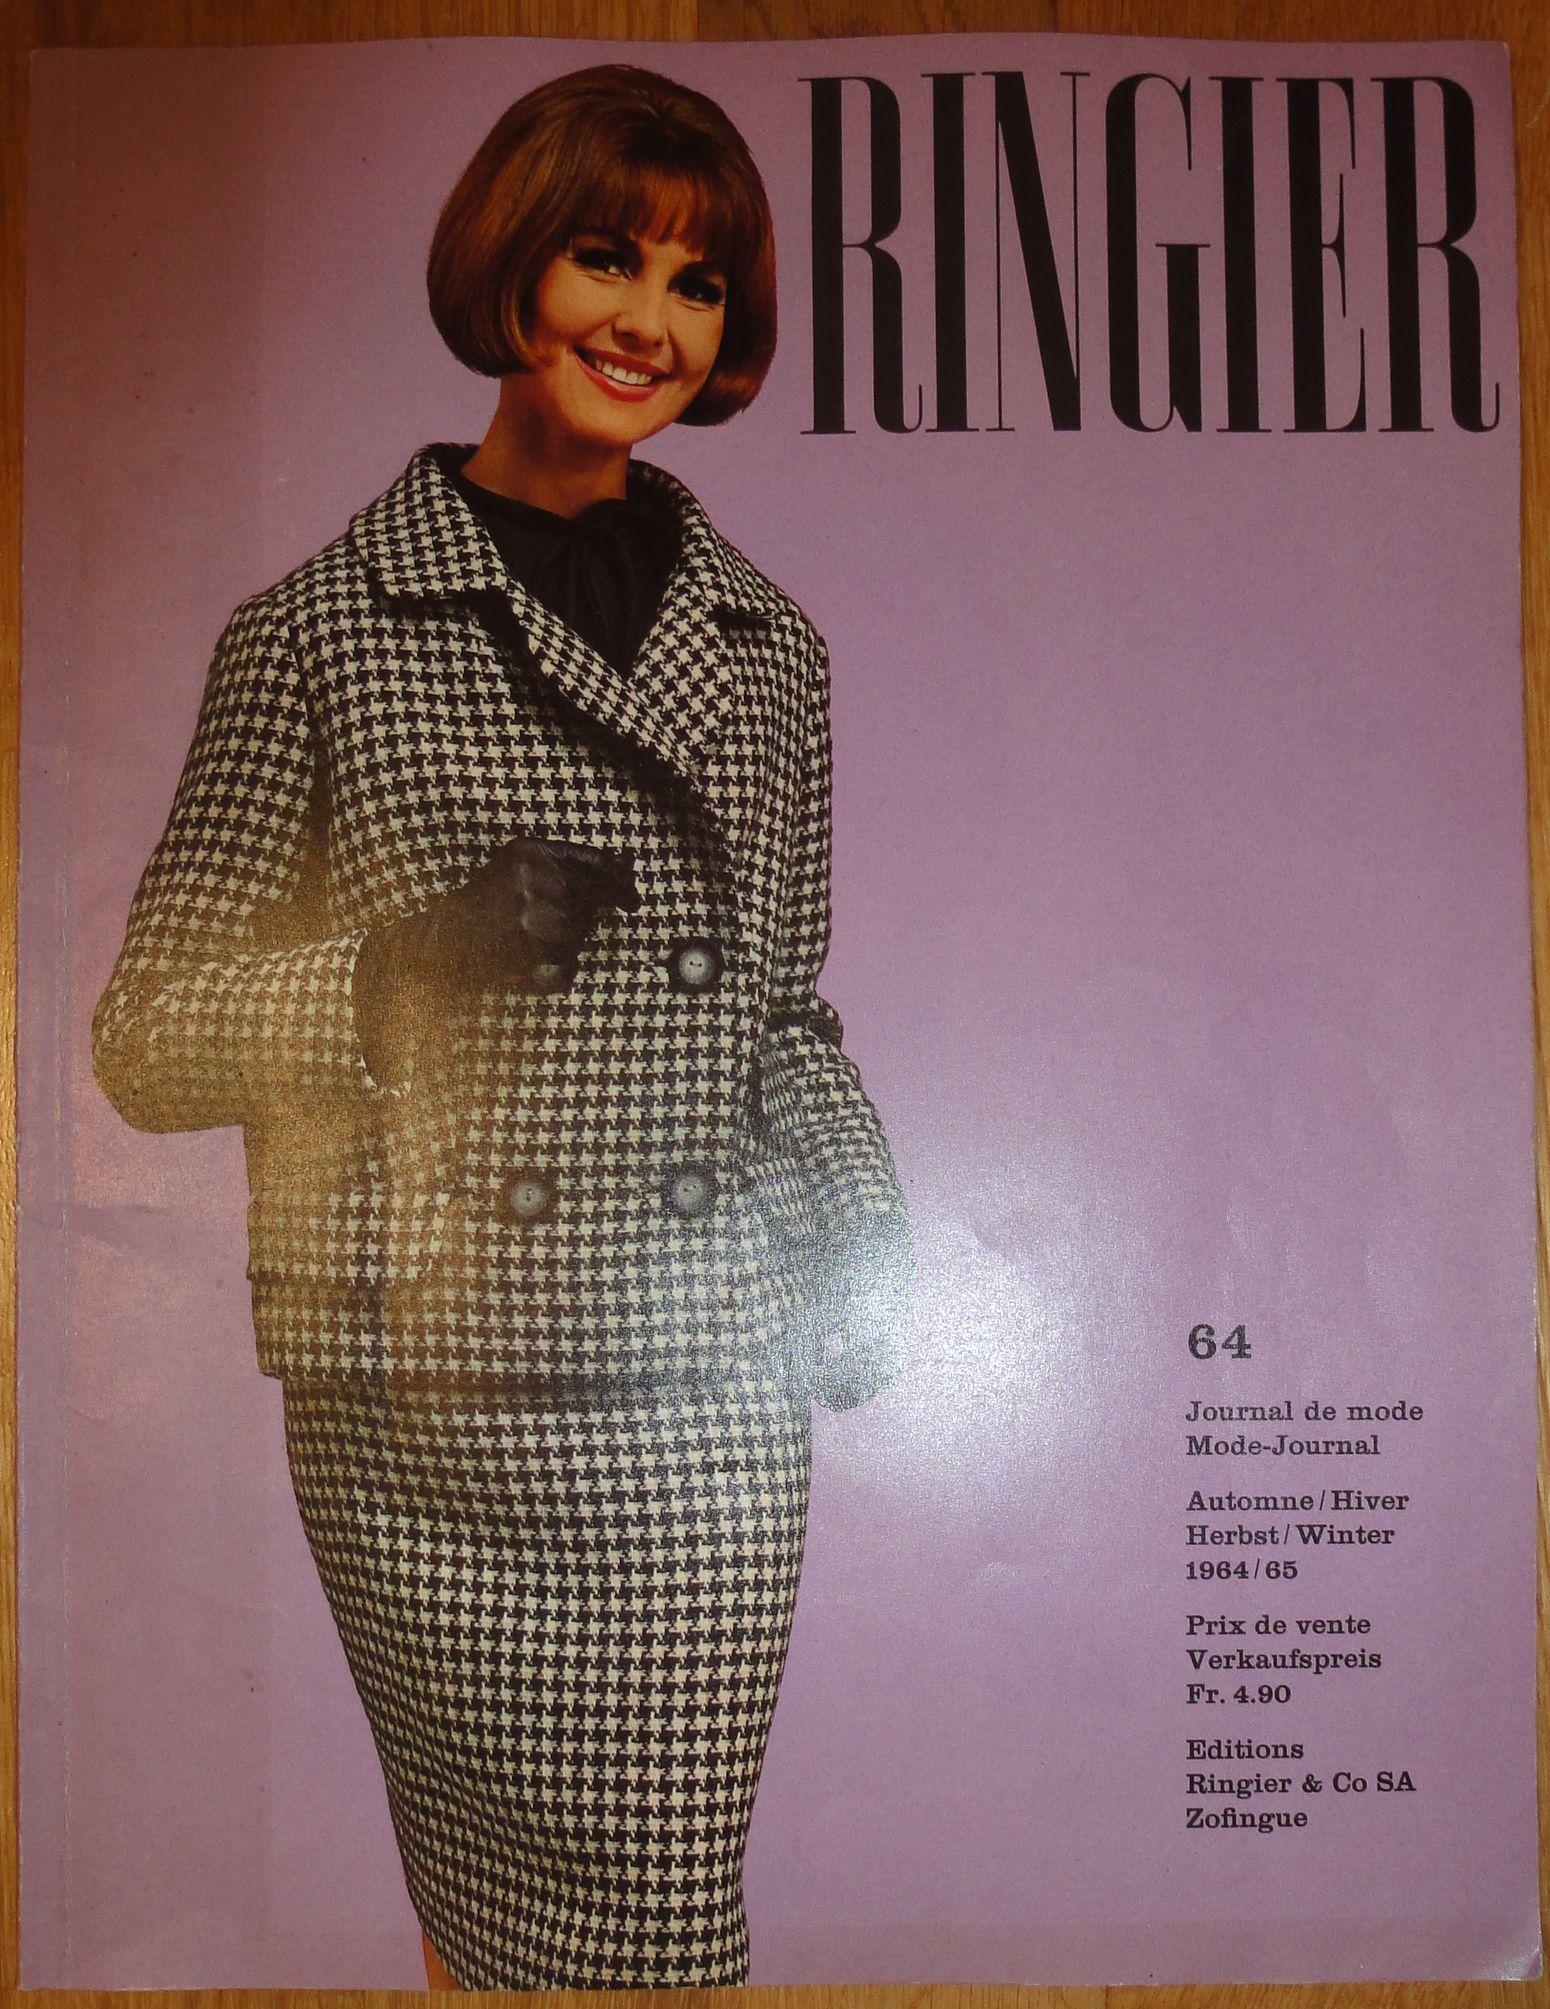 Ringier Journal de Mode Autumn/Winter 1964/65